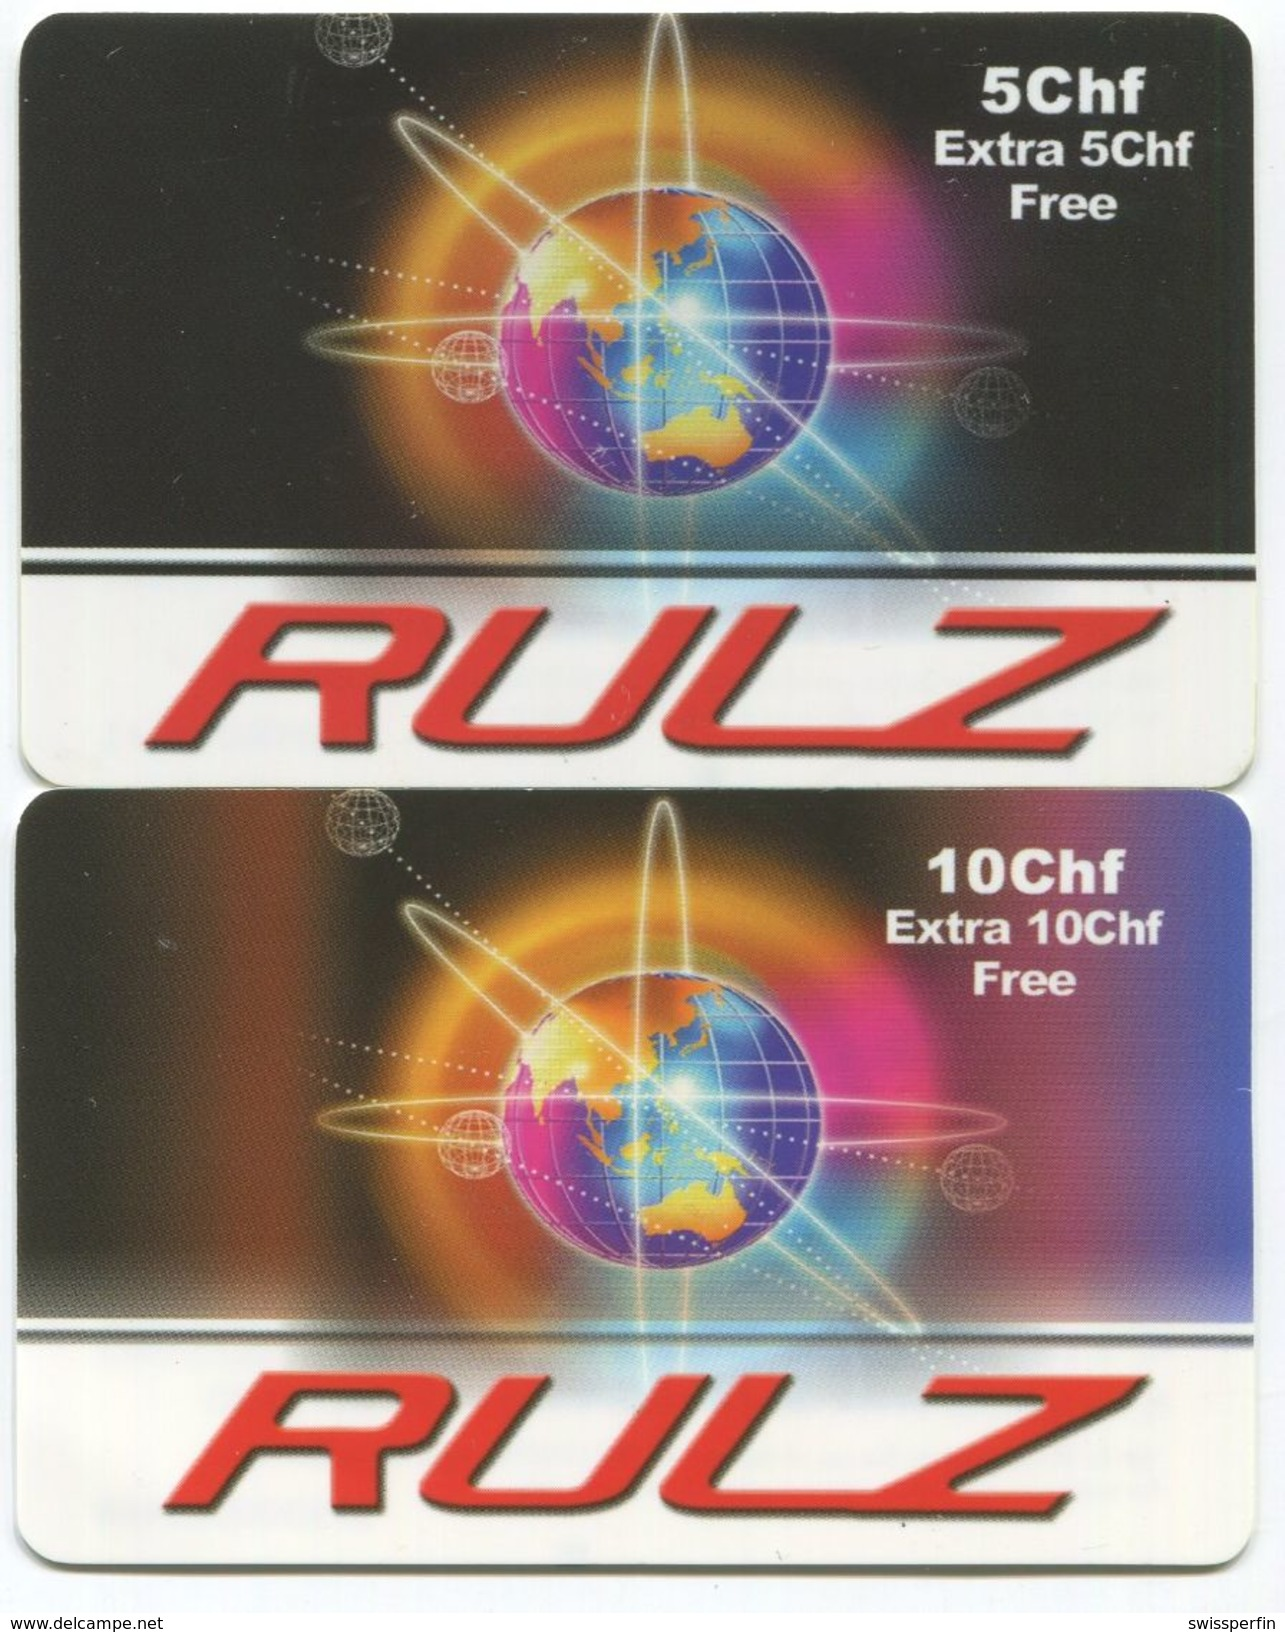 1697 - RULZ 5 + 10 CHF Prepaid Telefonkarte - Schweiz